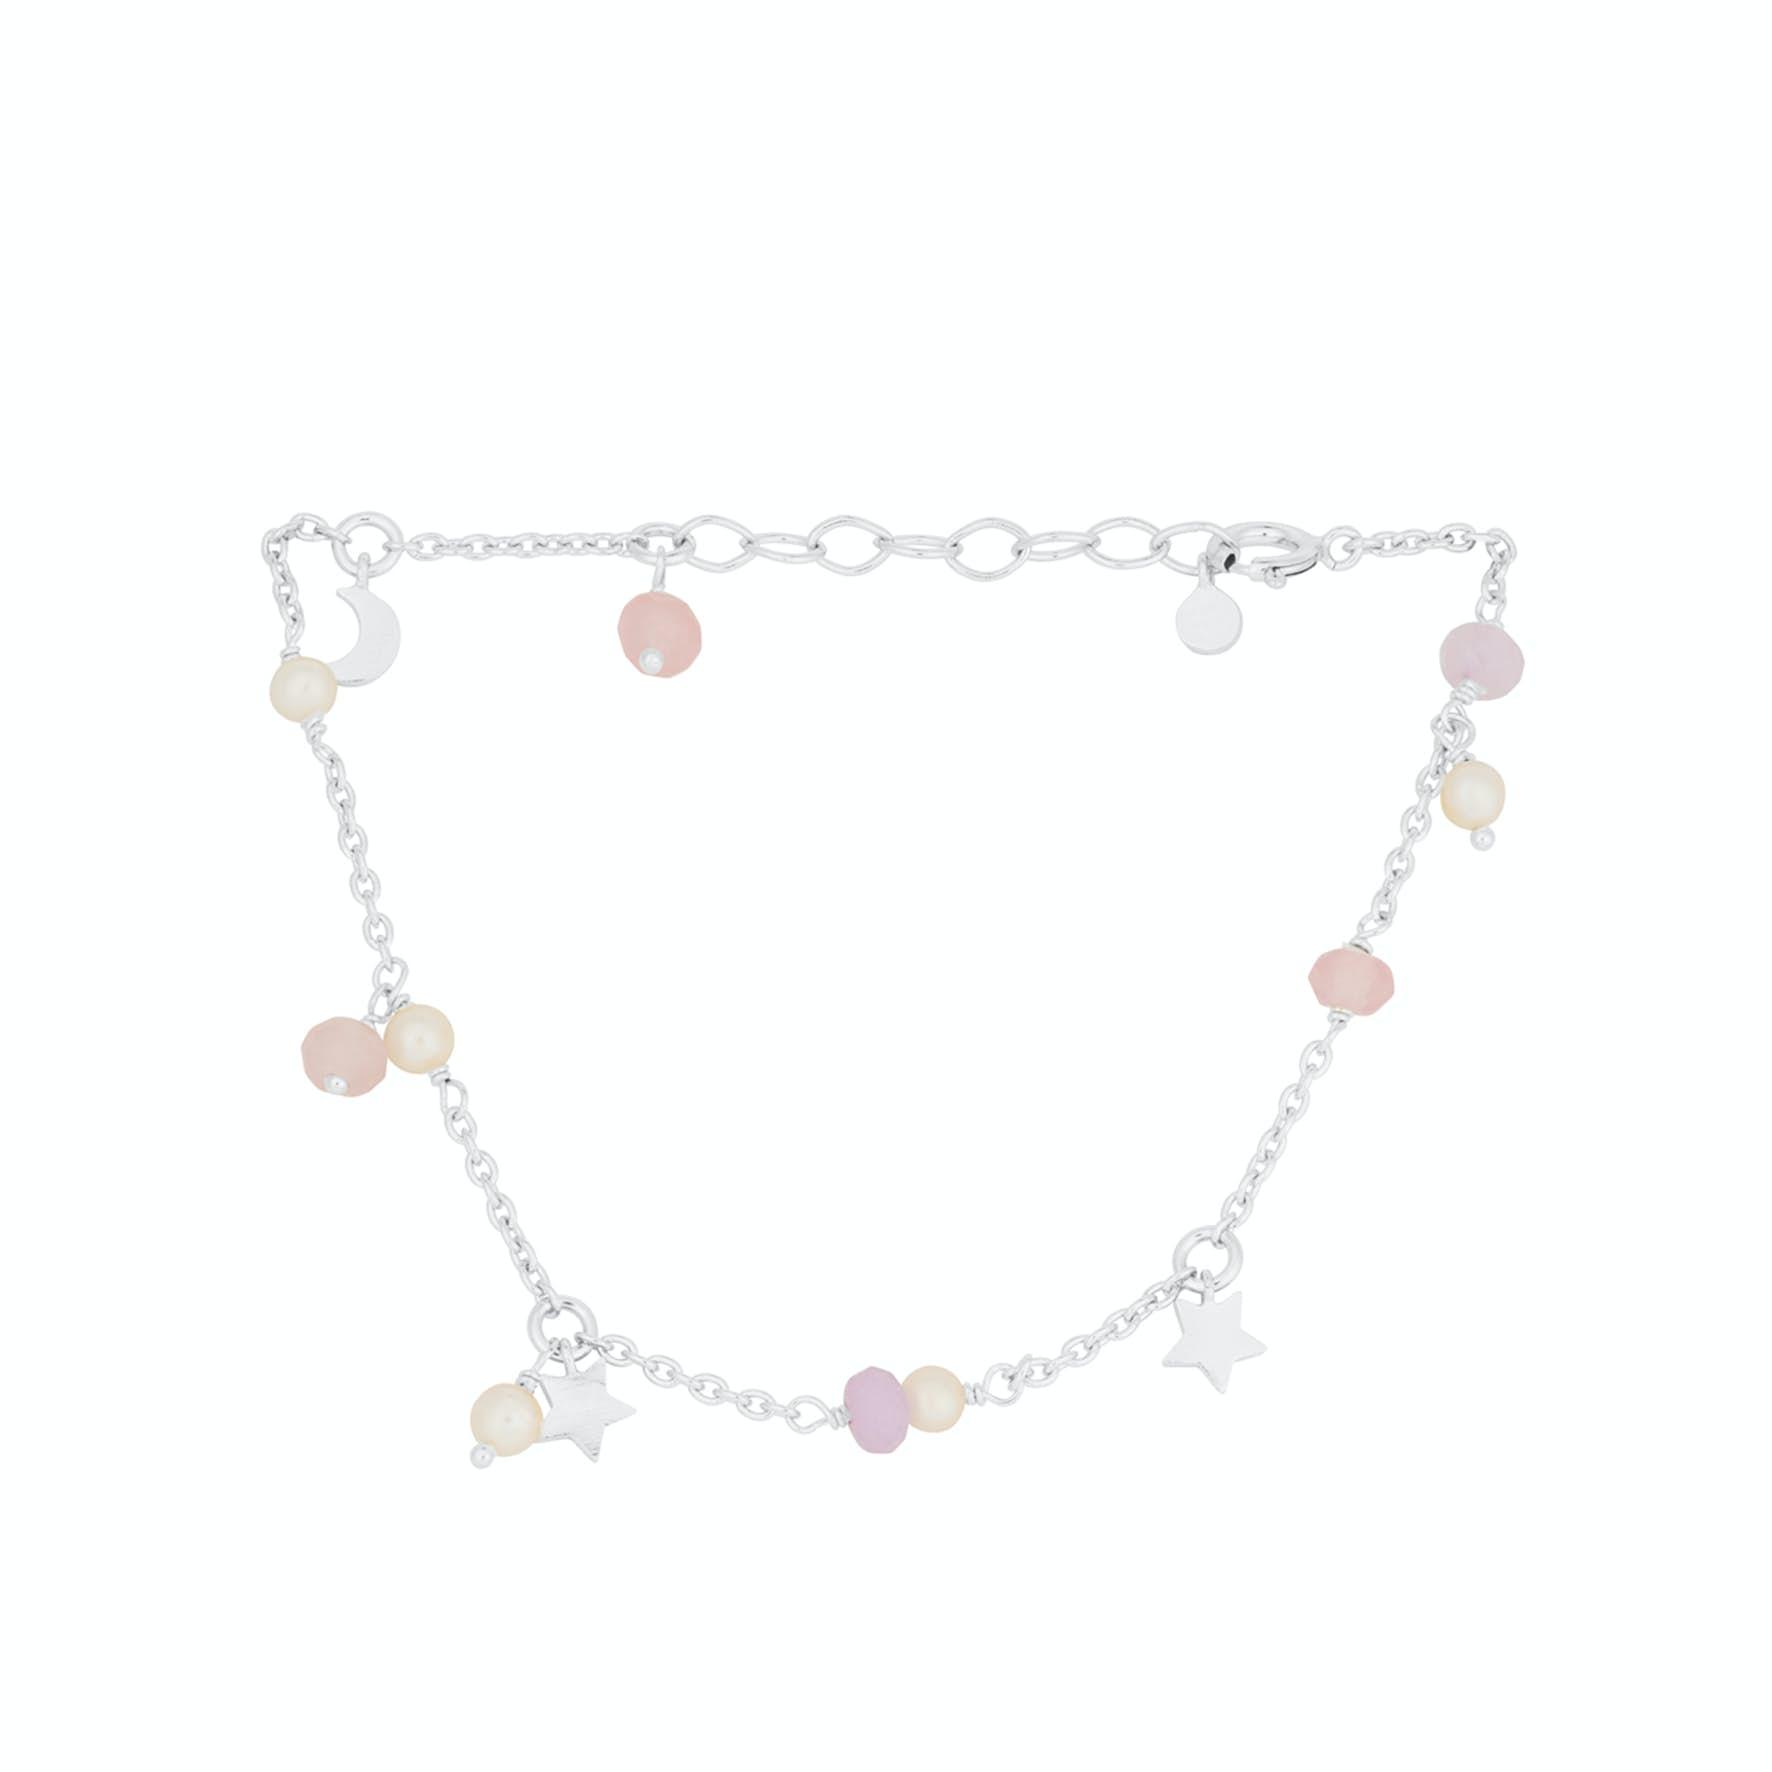 Pastel Dream Bracelet from Pernille Corydon in Silver Sterling 925  Pink Agate, Purple Agate,Freshwater Pearl